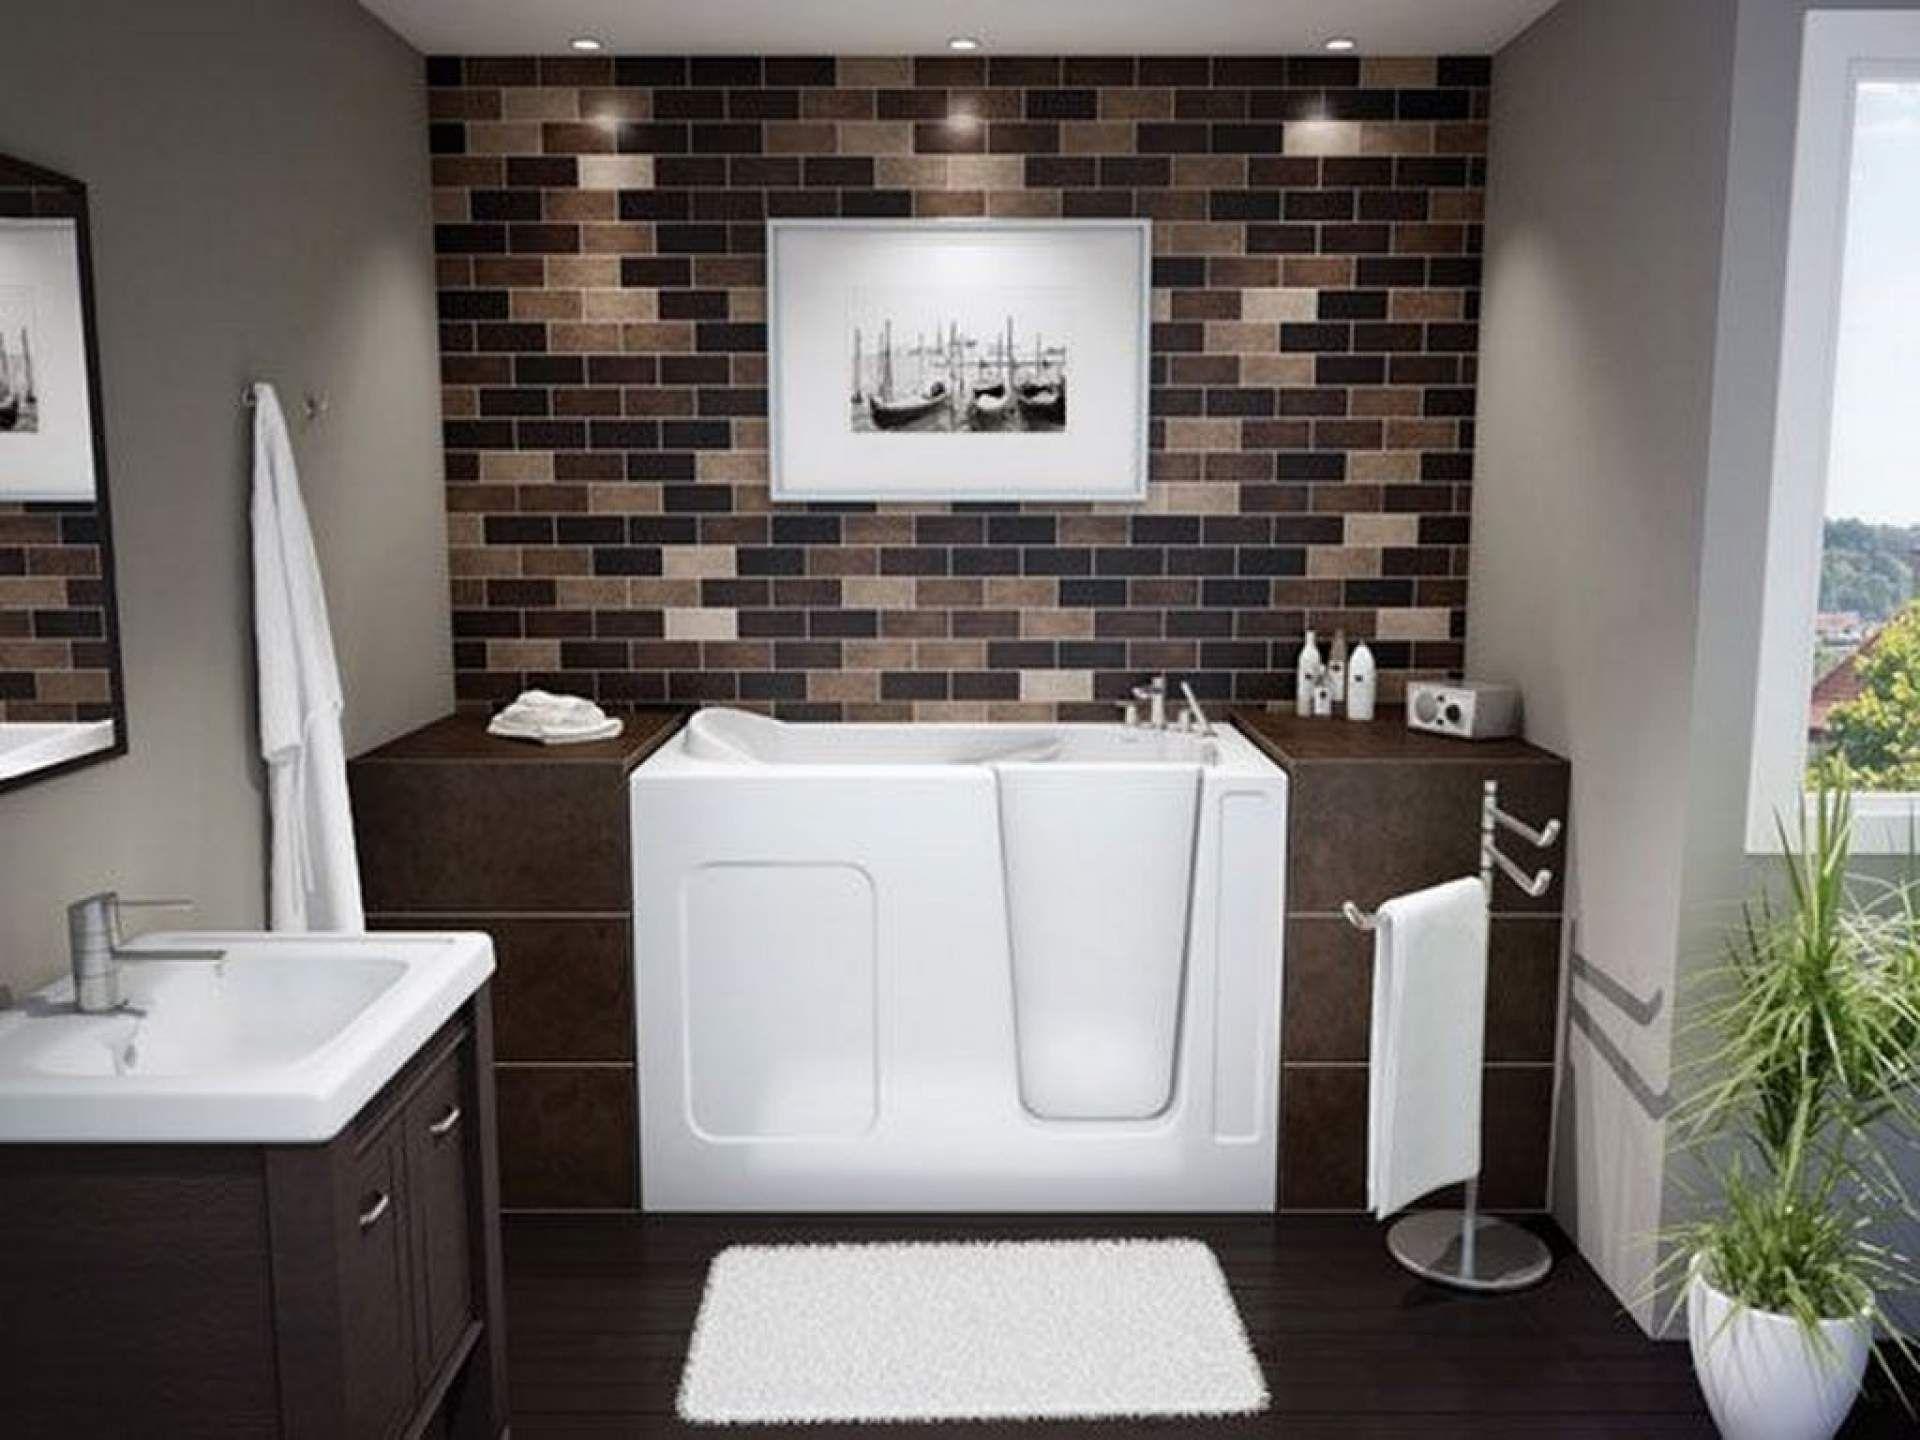 Bathroom : Bathroom Upgrade Ideas Blue Subway Tile With Bathtub Shower  Combo Bathroom Vanities With Tops